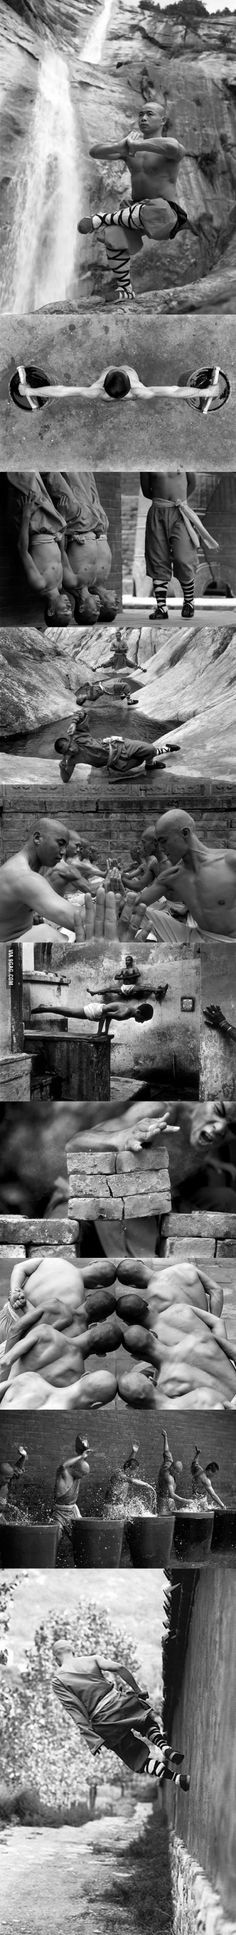 The Dedication of Shaolin Monks